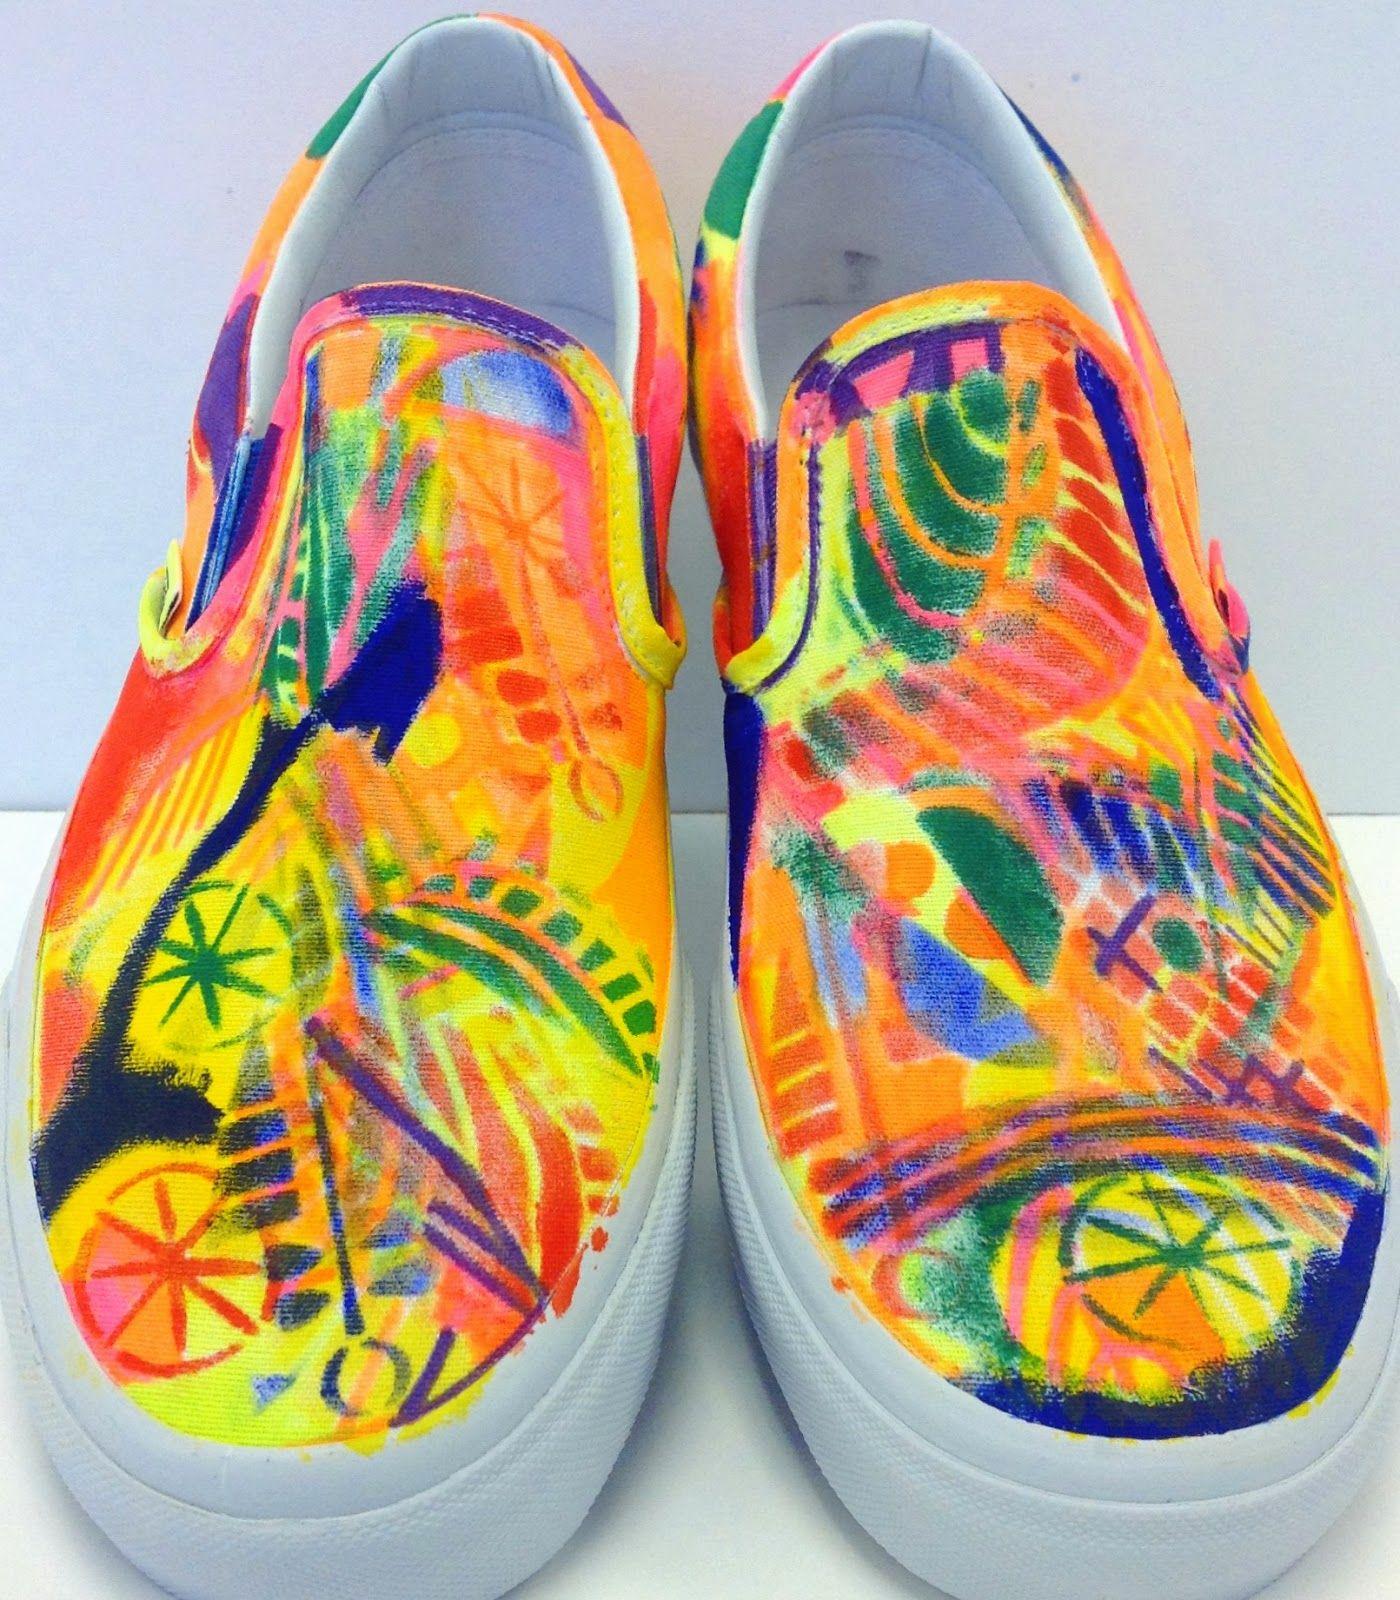 StencilGirl Talk: Stenciling Shoes!